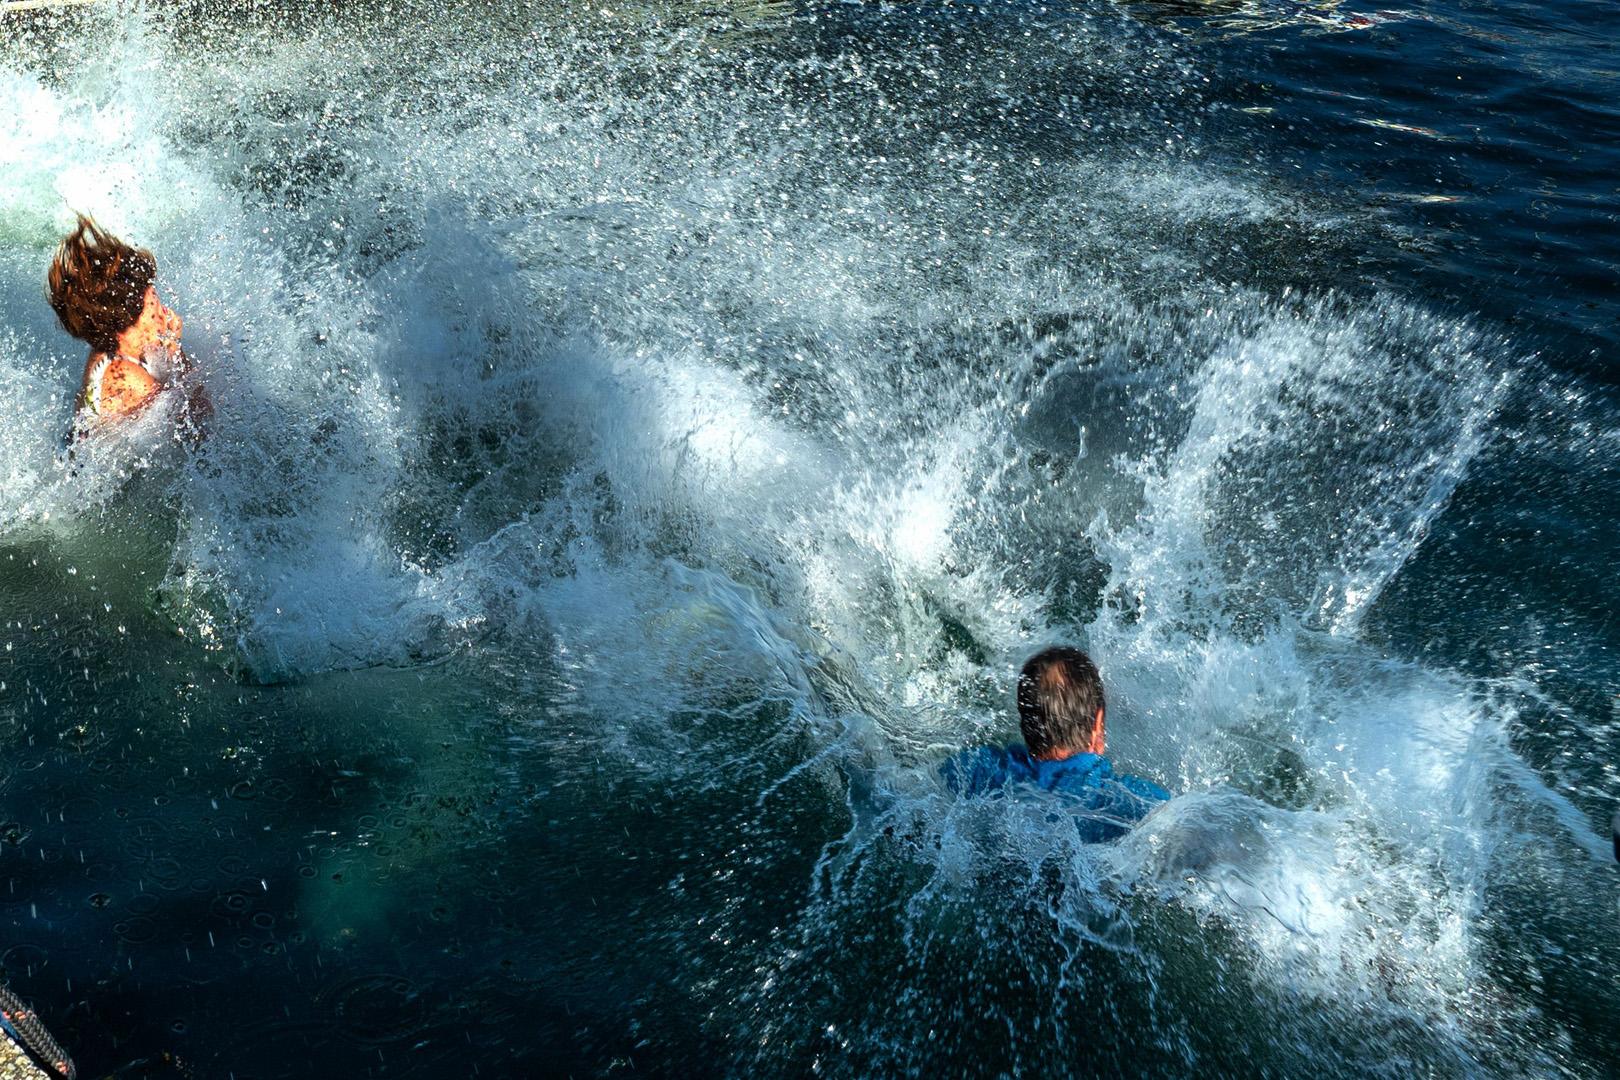 Splash - Claire Sick